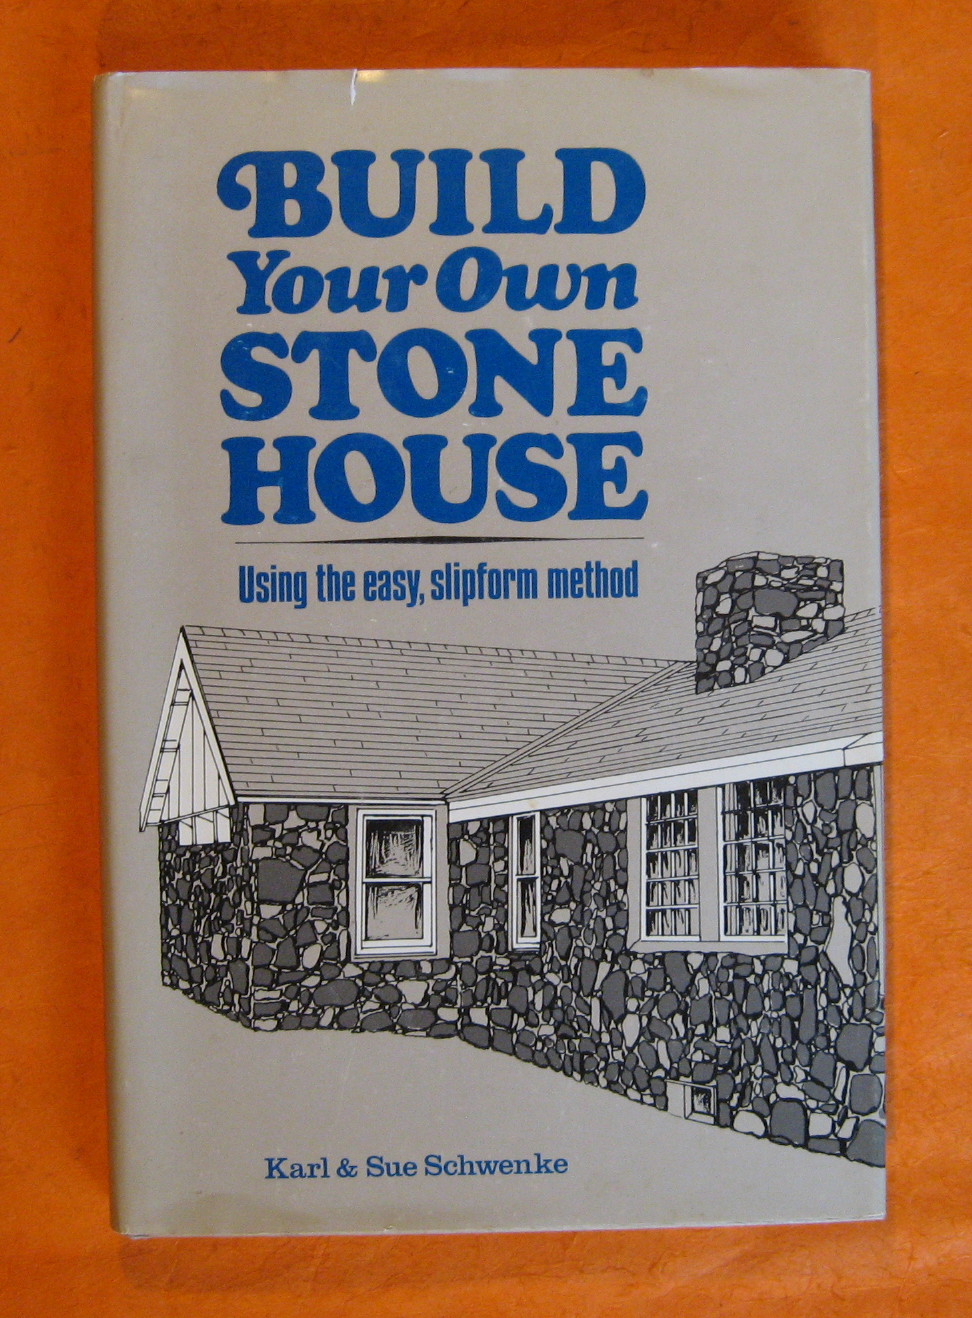 Build Your Own Stone House: Using the Easy, Slipform Method, Karl Schwenke; Sue Schwenke